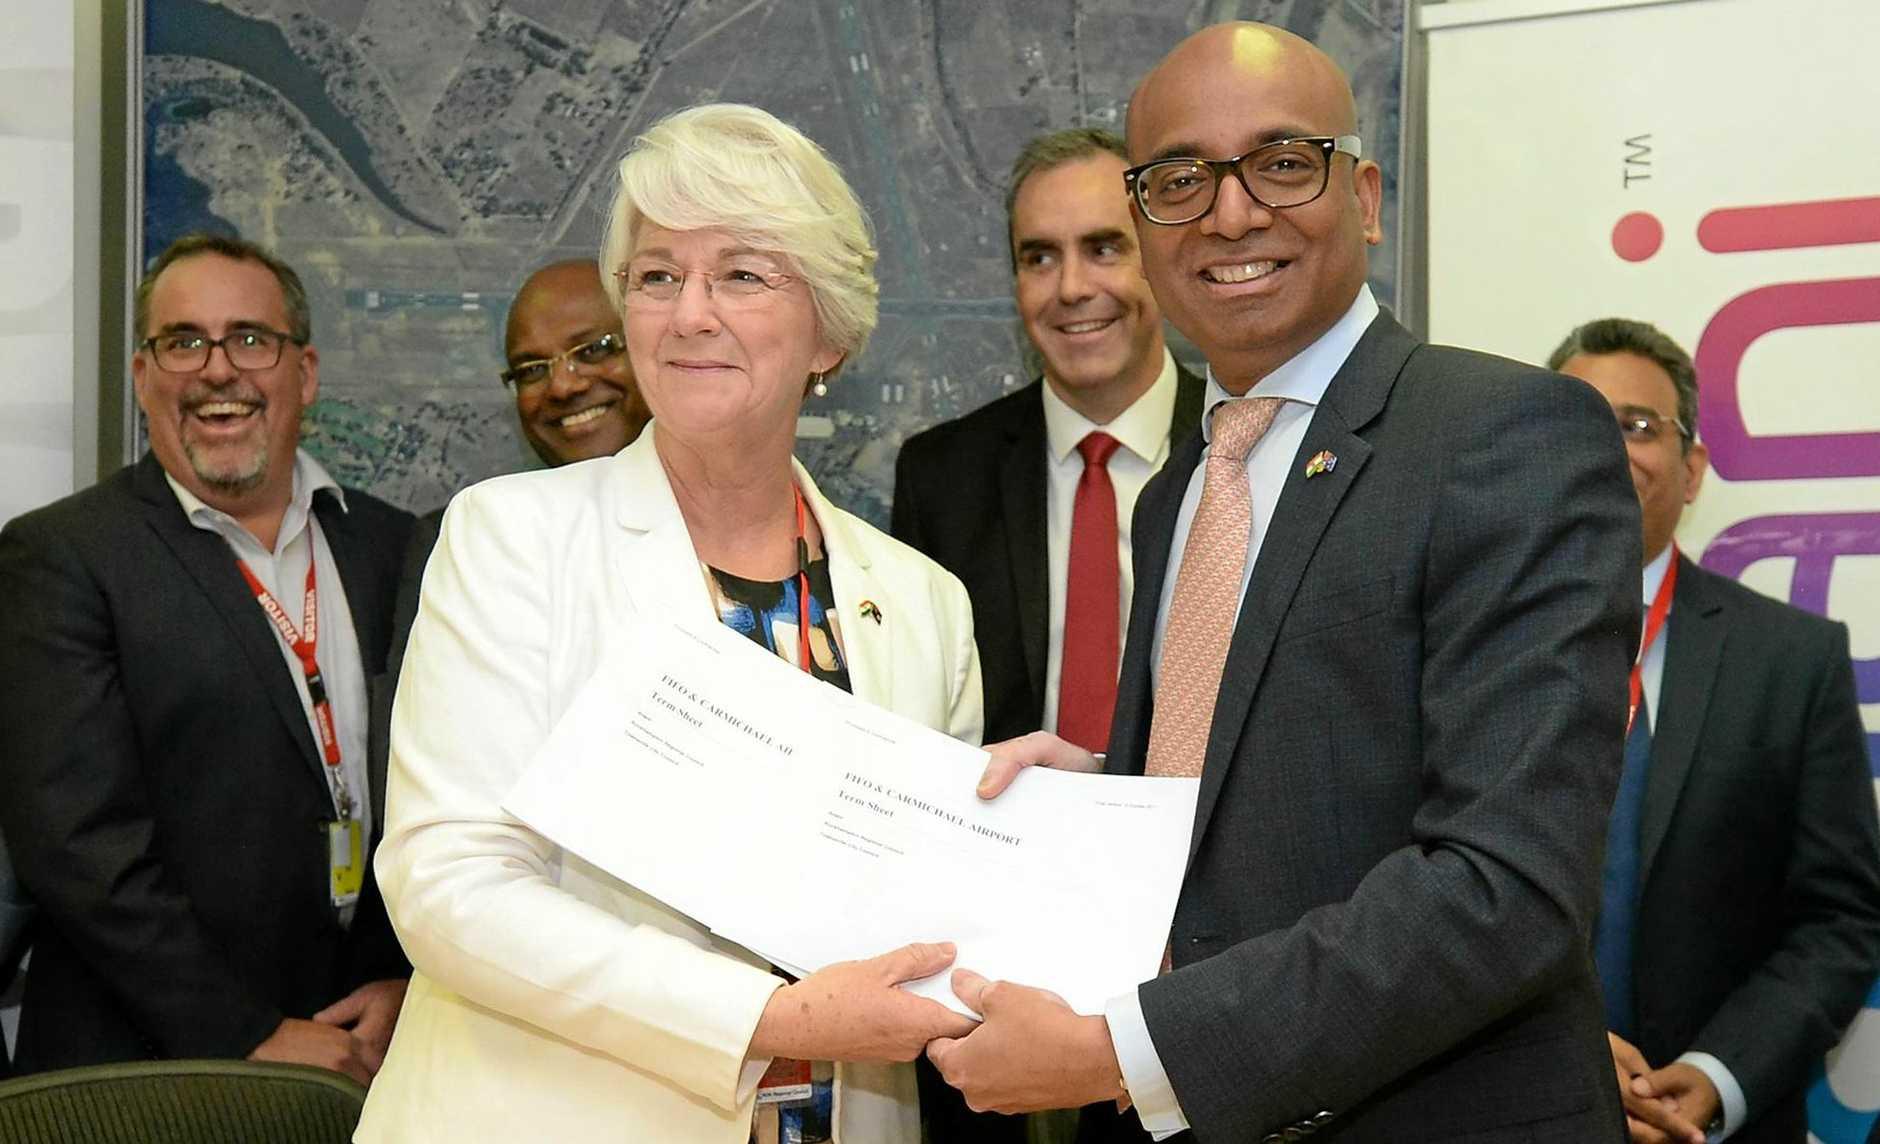 DONE DEAL: Rockhampton Mayor Margaret Stelow with Adani Australia CEO Jeyakumar Janakaraj sign the MOU regarding the Charmichael Mine FIFO hub at Rockhampton Airport on Thursday.